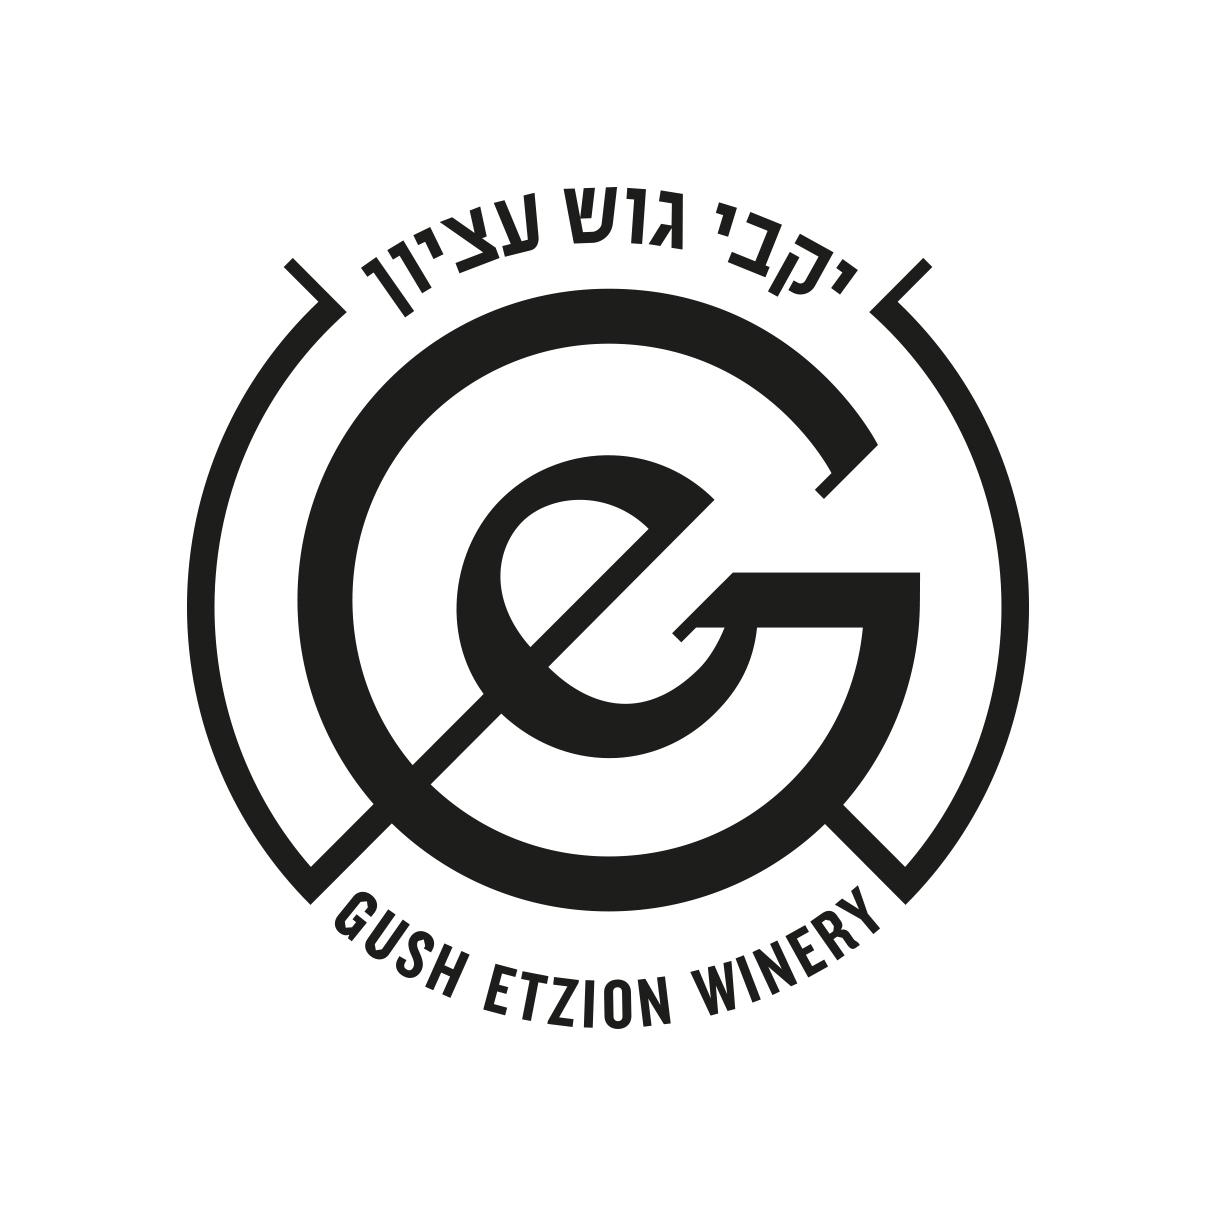 Gush Etzion logo